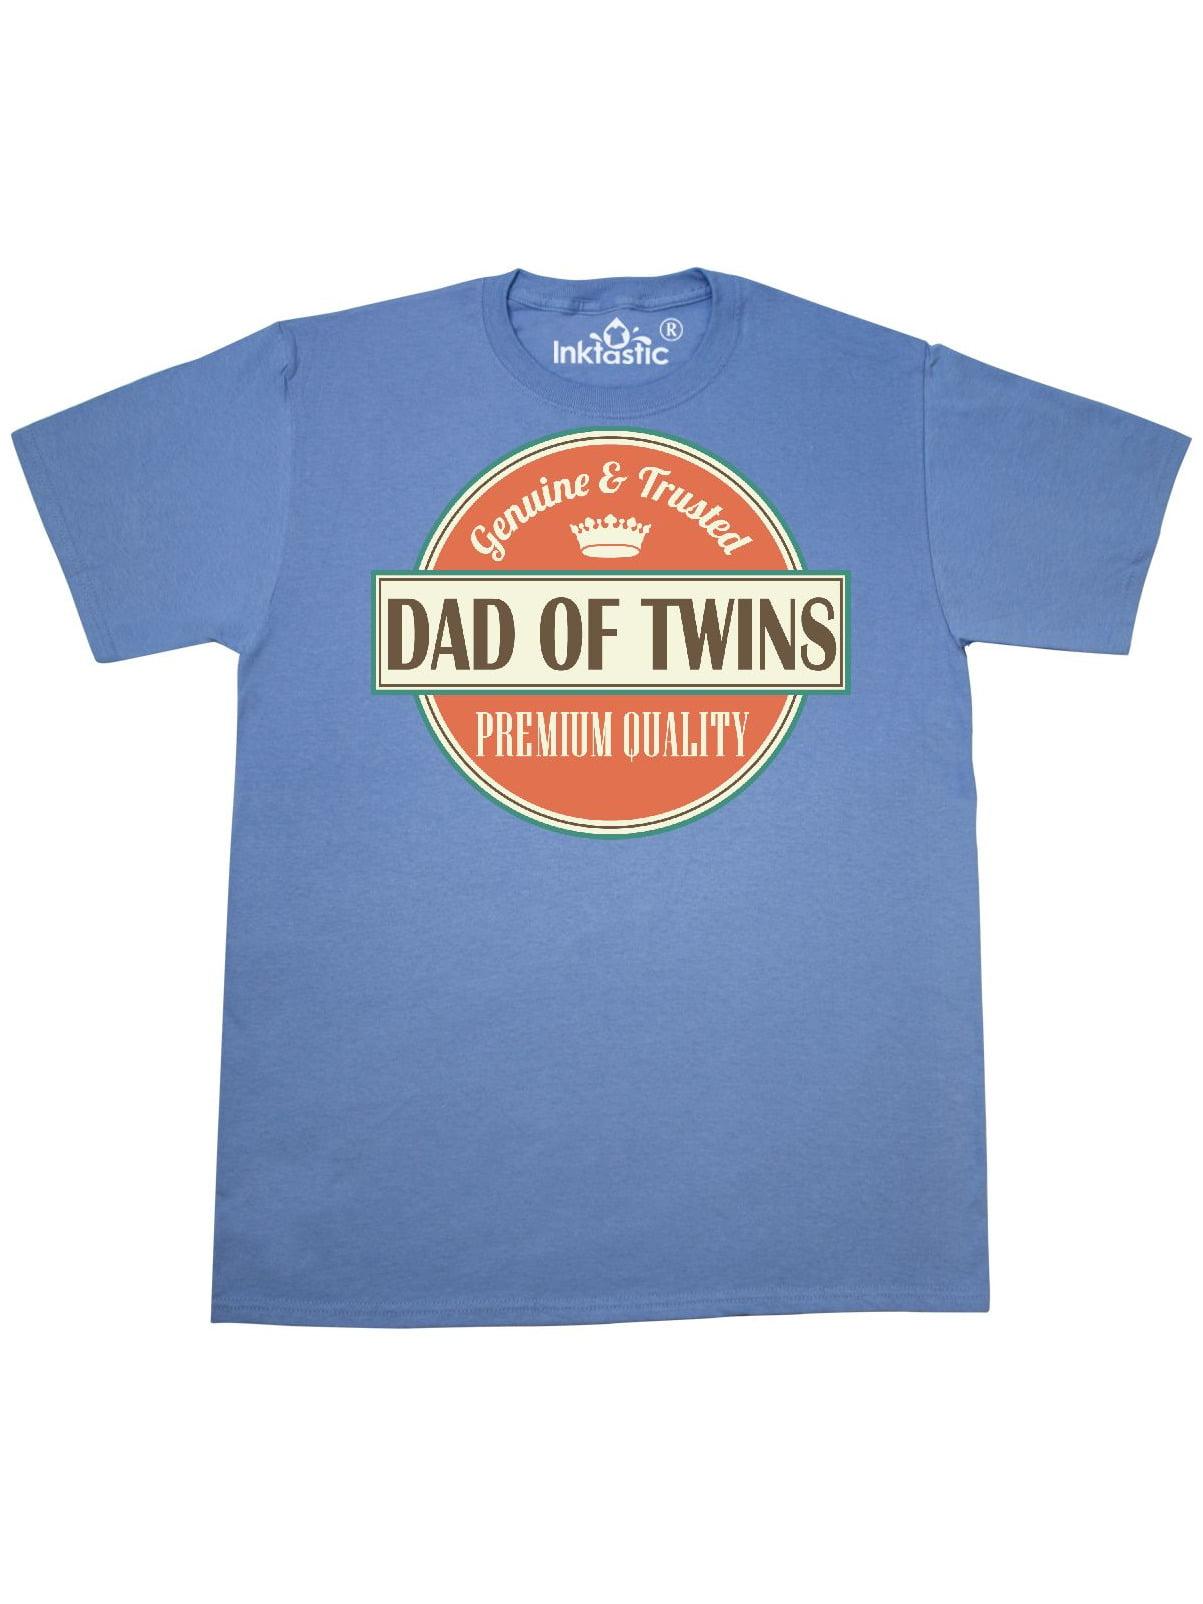 5d784dde Inktastic - Dad Of Twins vintage T-Shirt - Walmart.com